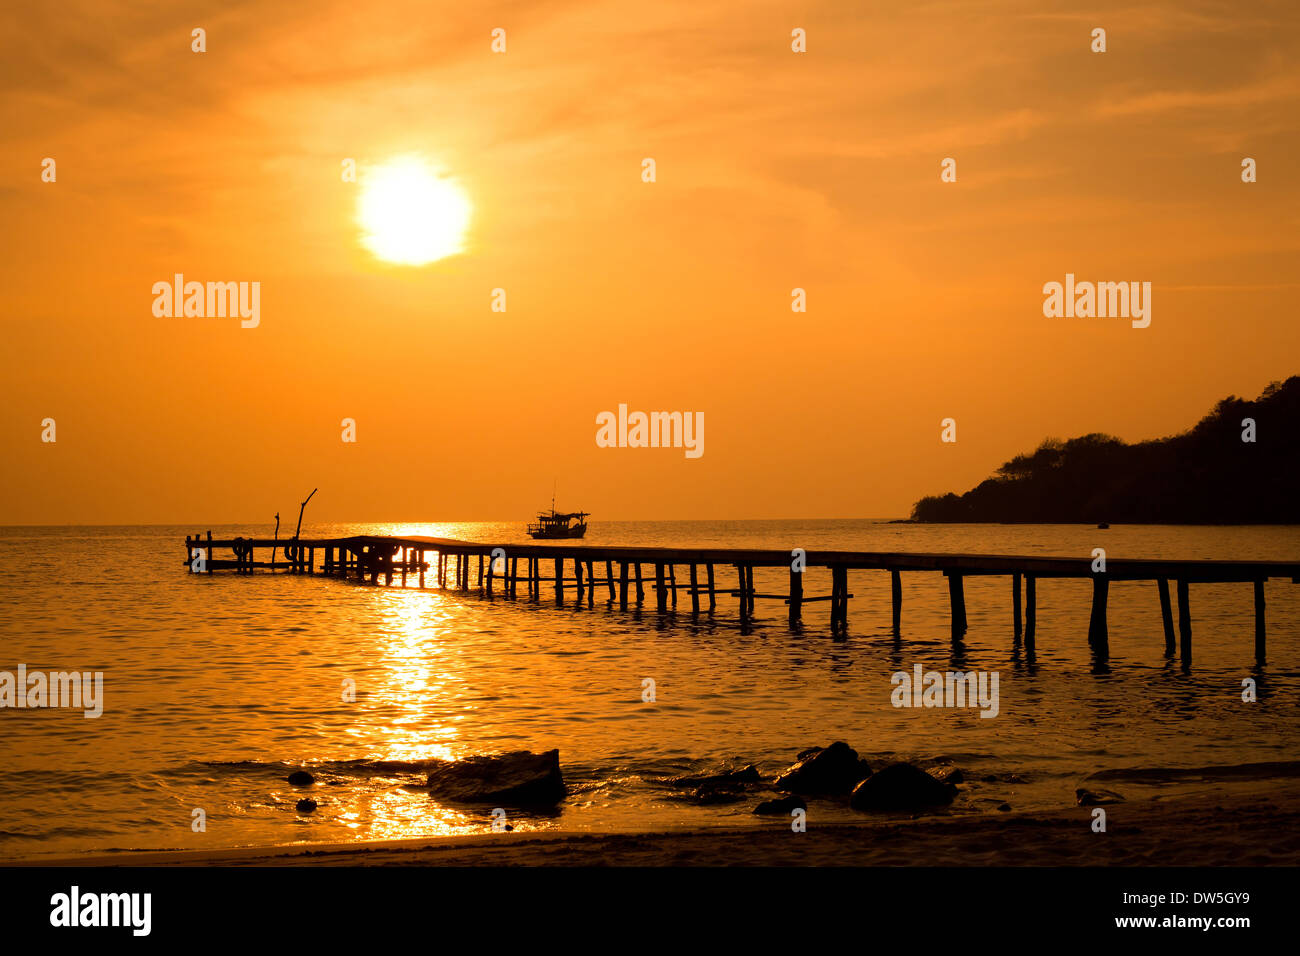 Playa tropical al atardecer Imagen De Stock